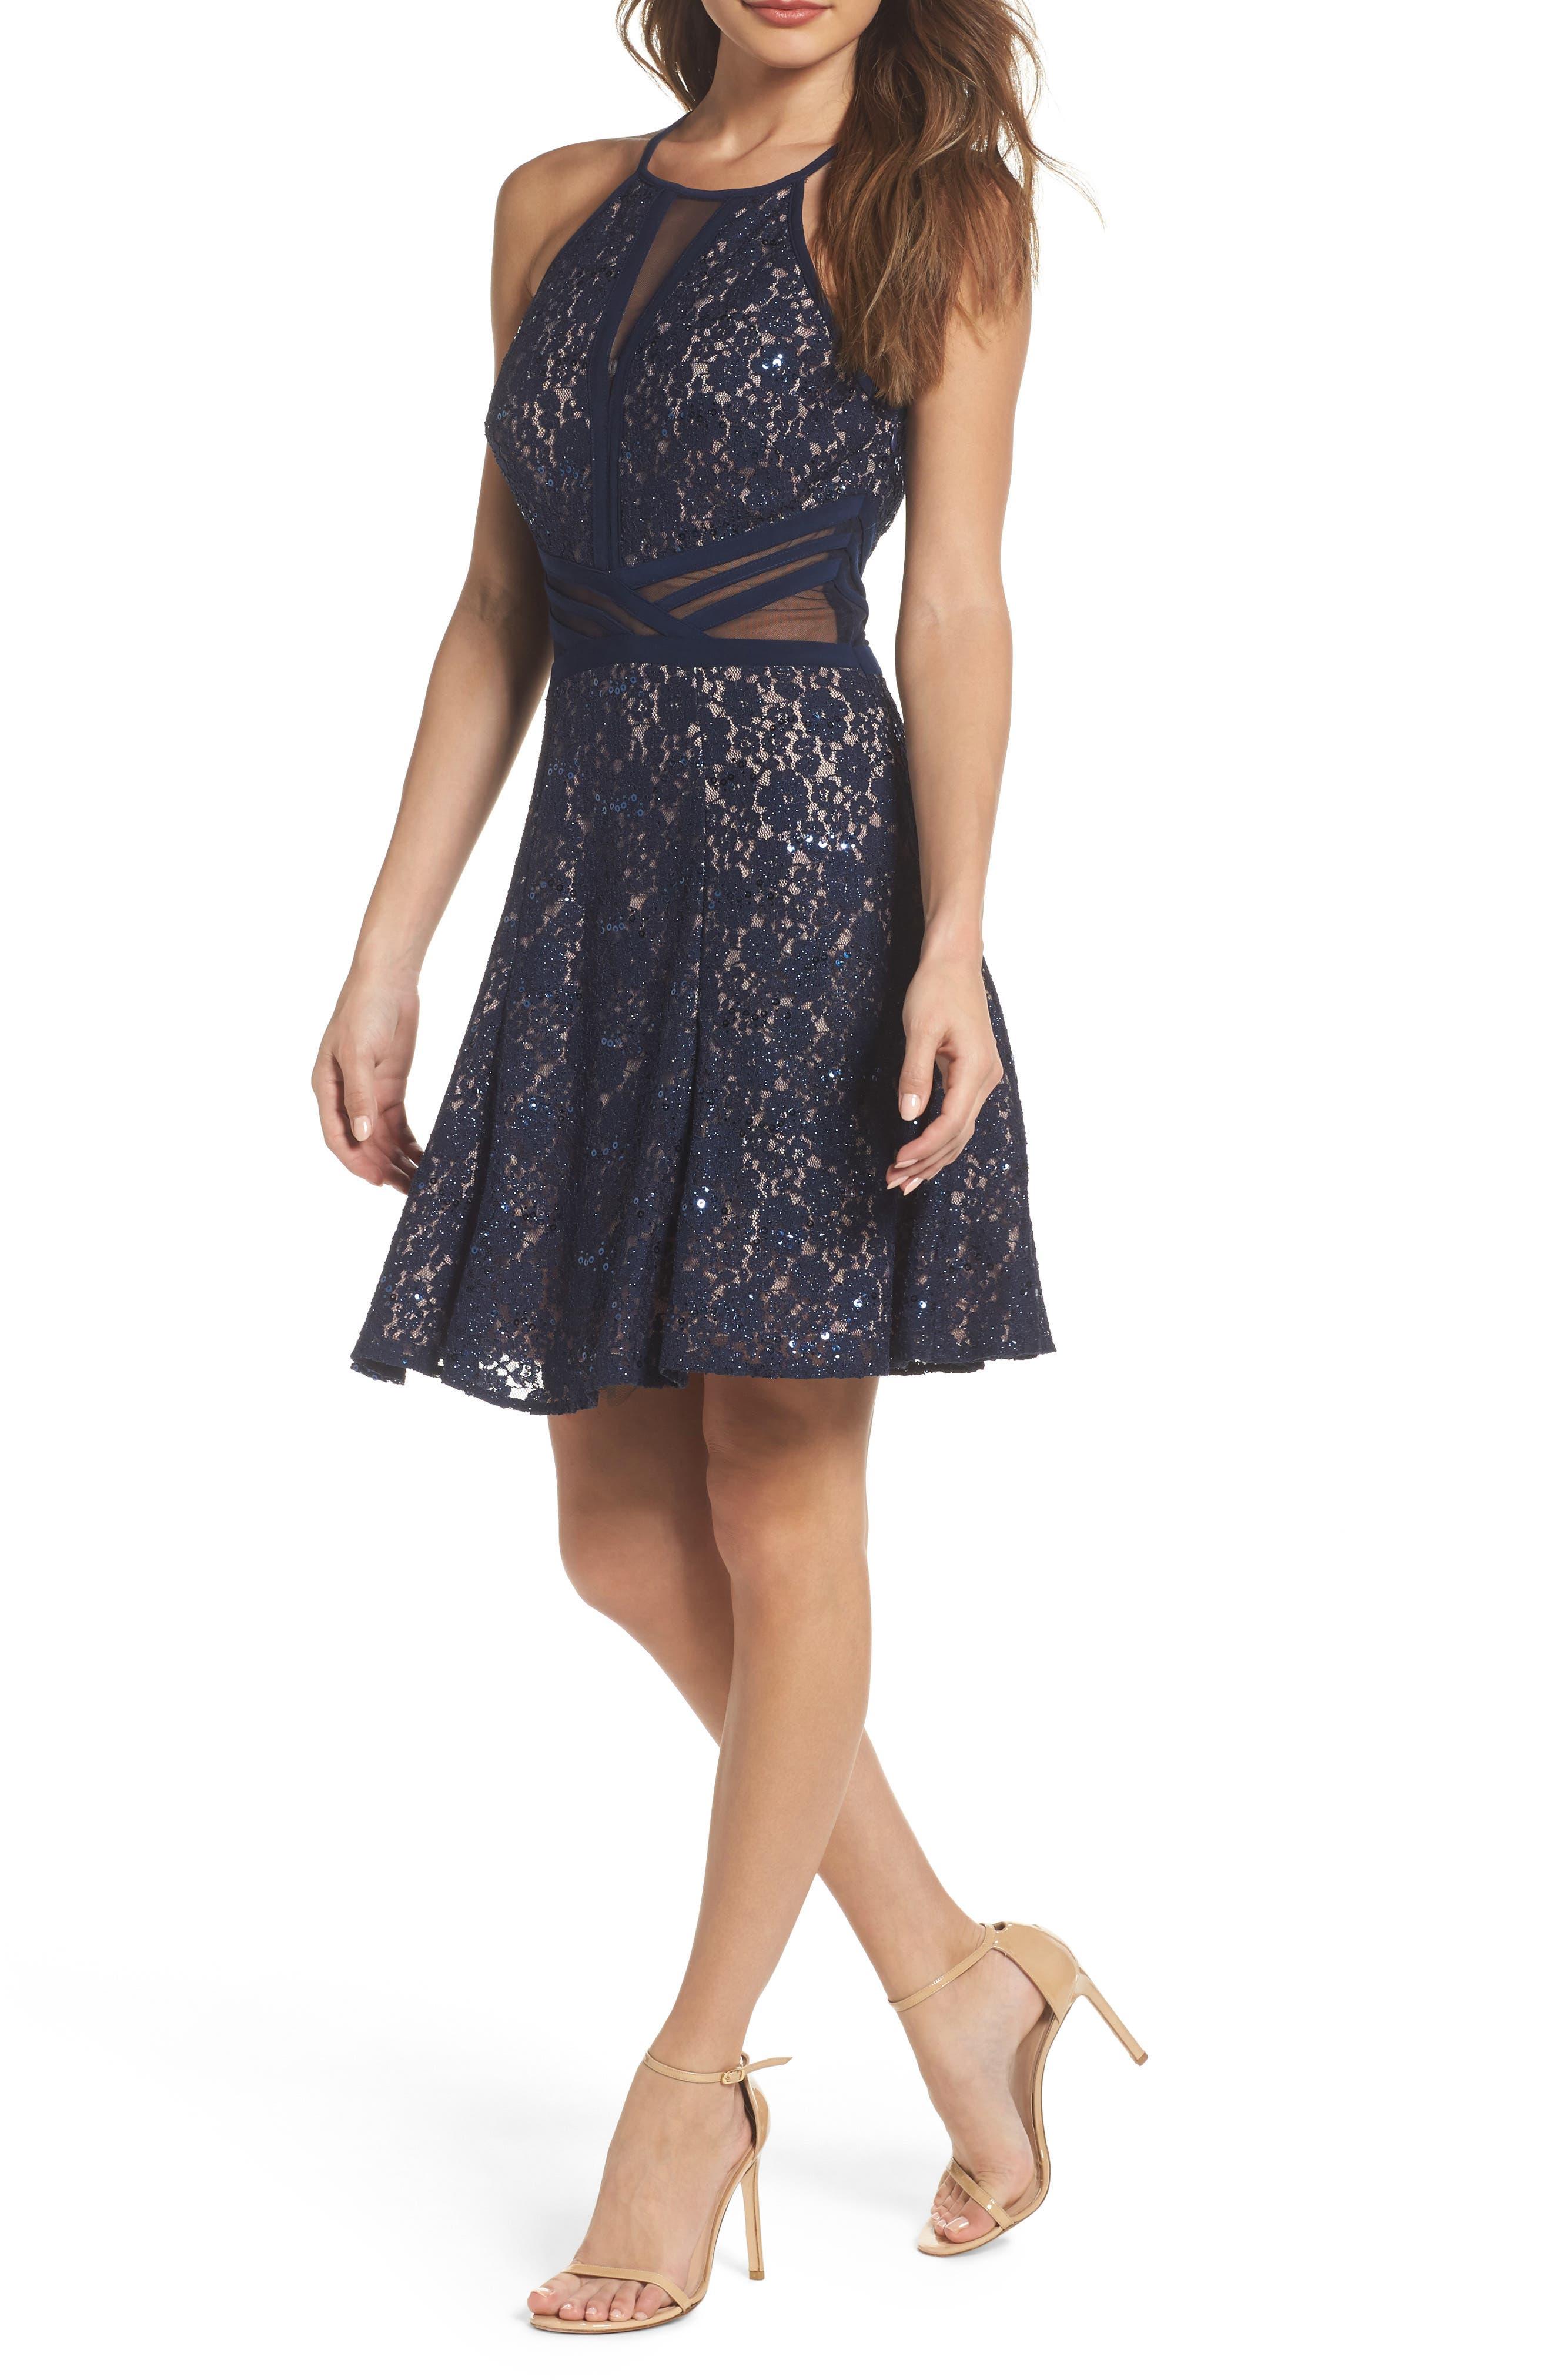 Main Image - Morgan & Co. Sheer Inset Lace Fit & Flare Dress